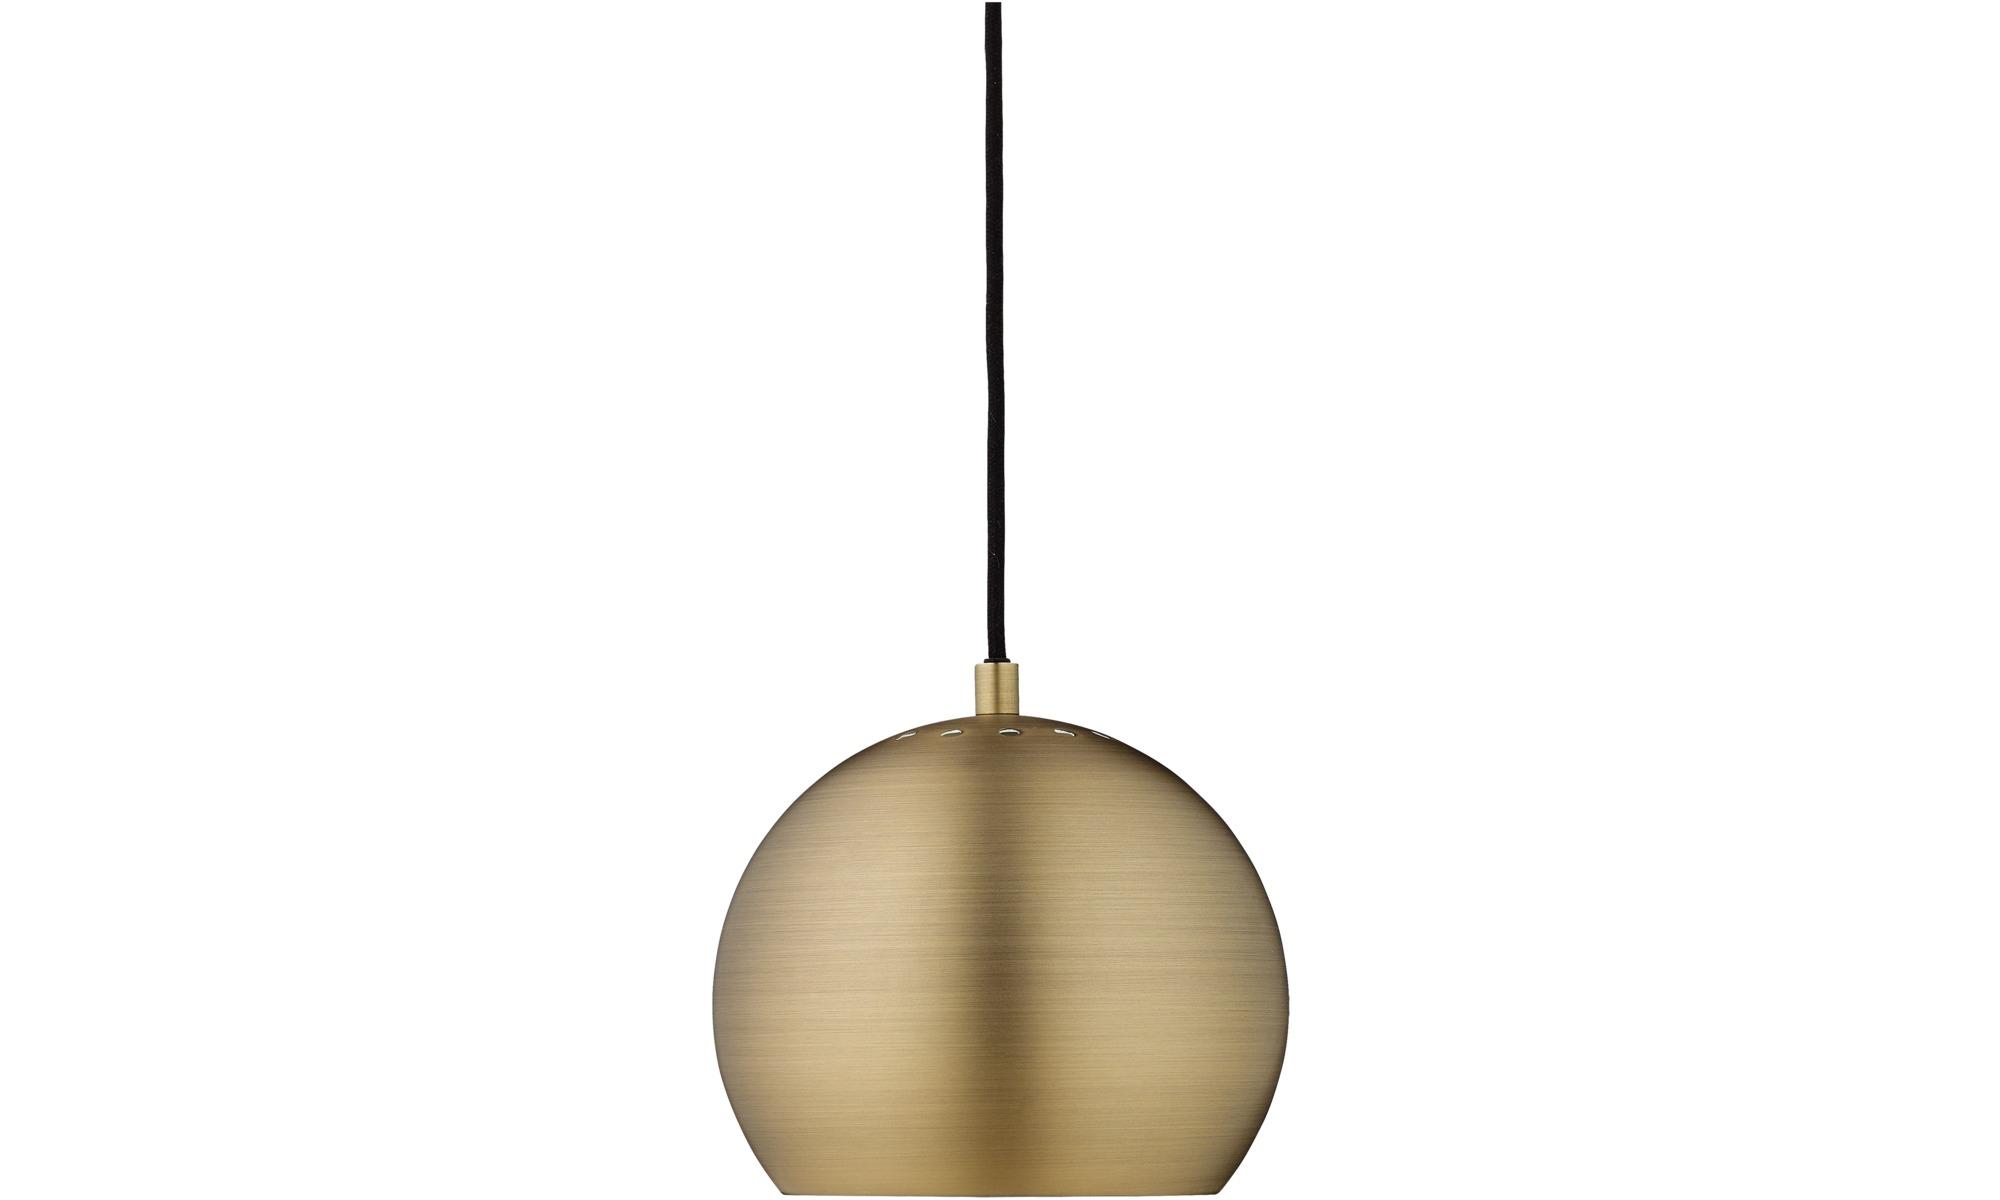 Lampor - Ball taklampa - Gul - Metall